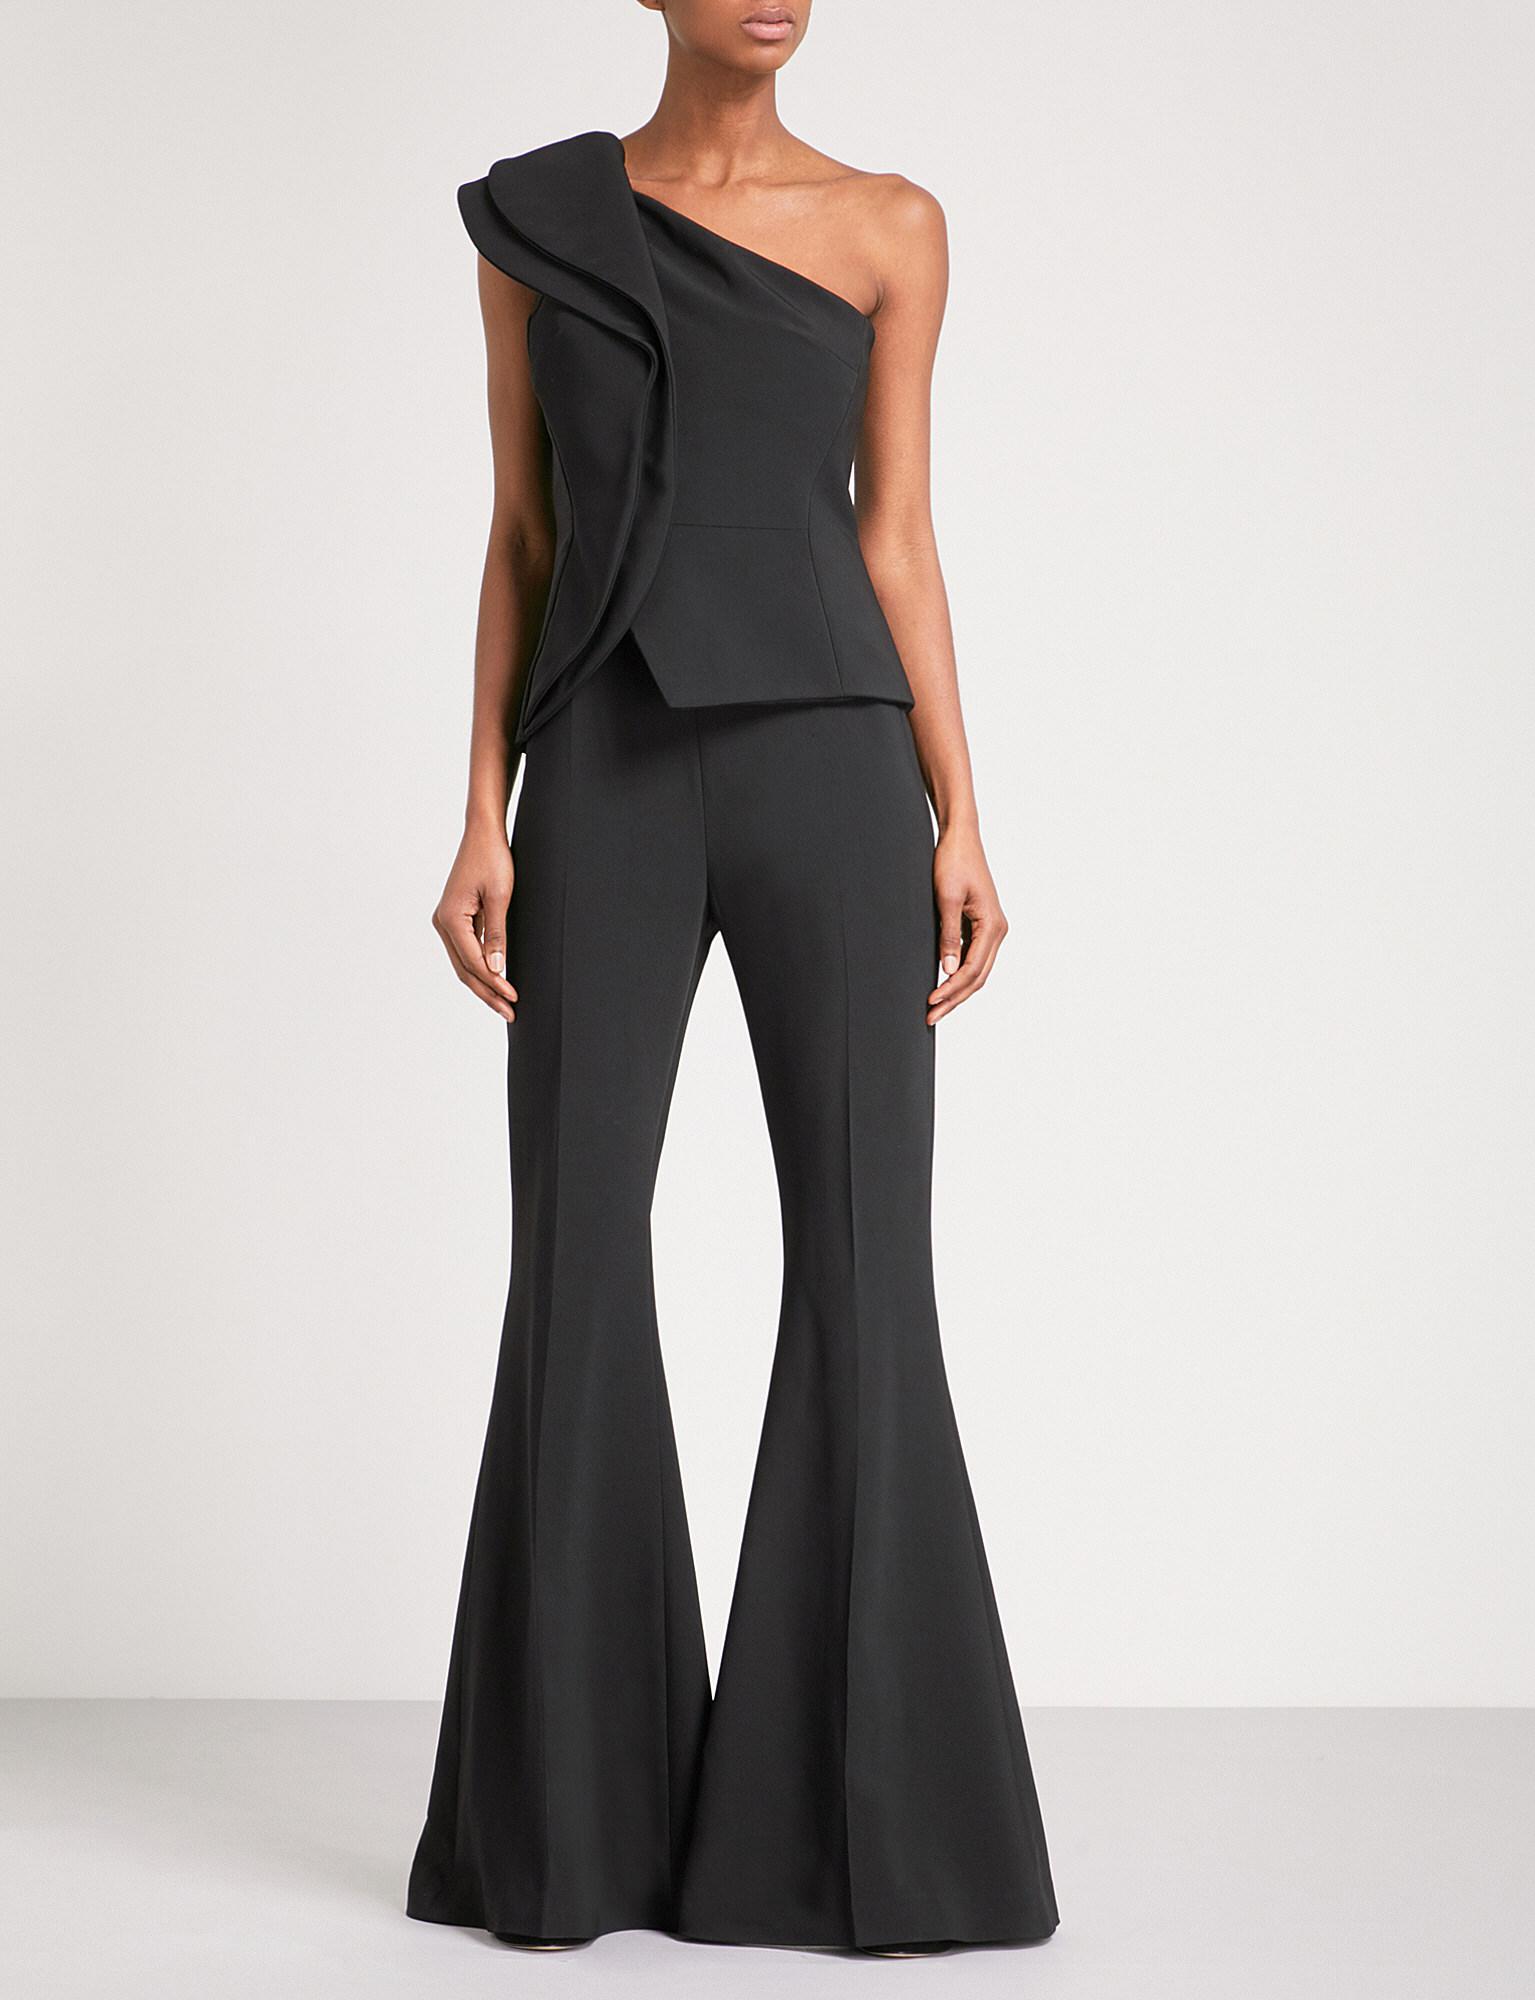 e7602a46a979 Lyst - Antonio Berardi Moreno One-shoulder Crepe Jumpsuit in Black